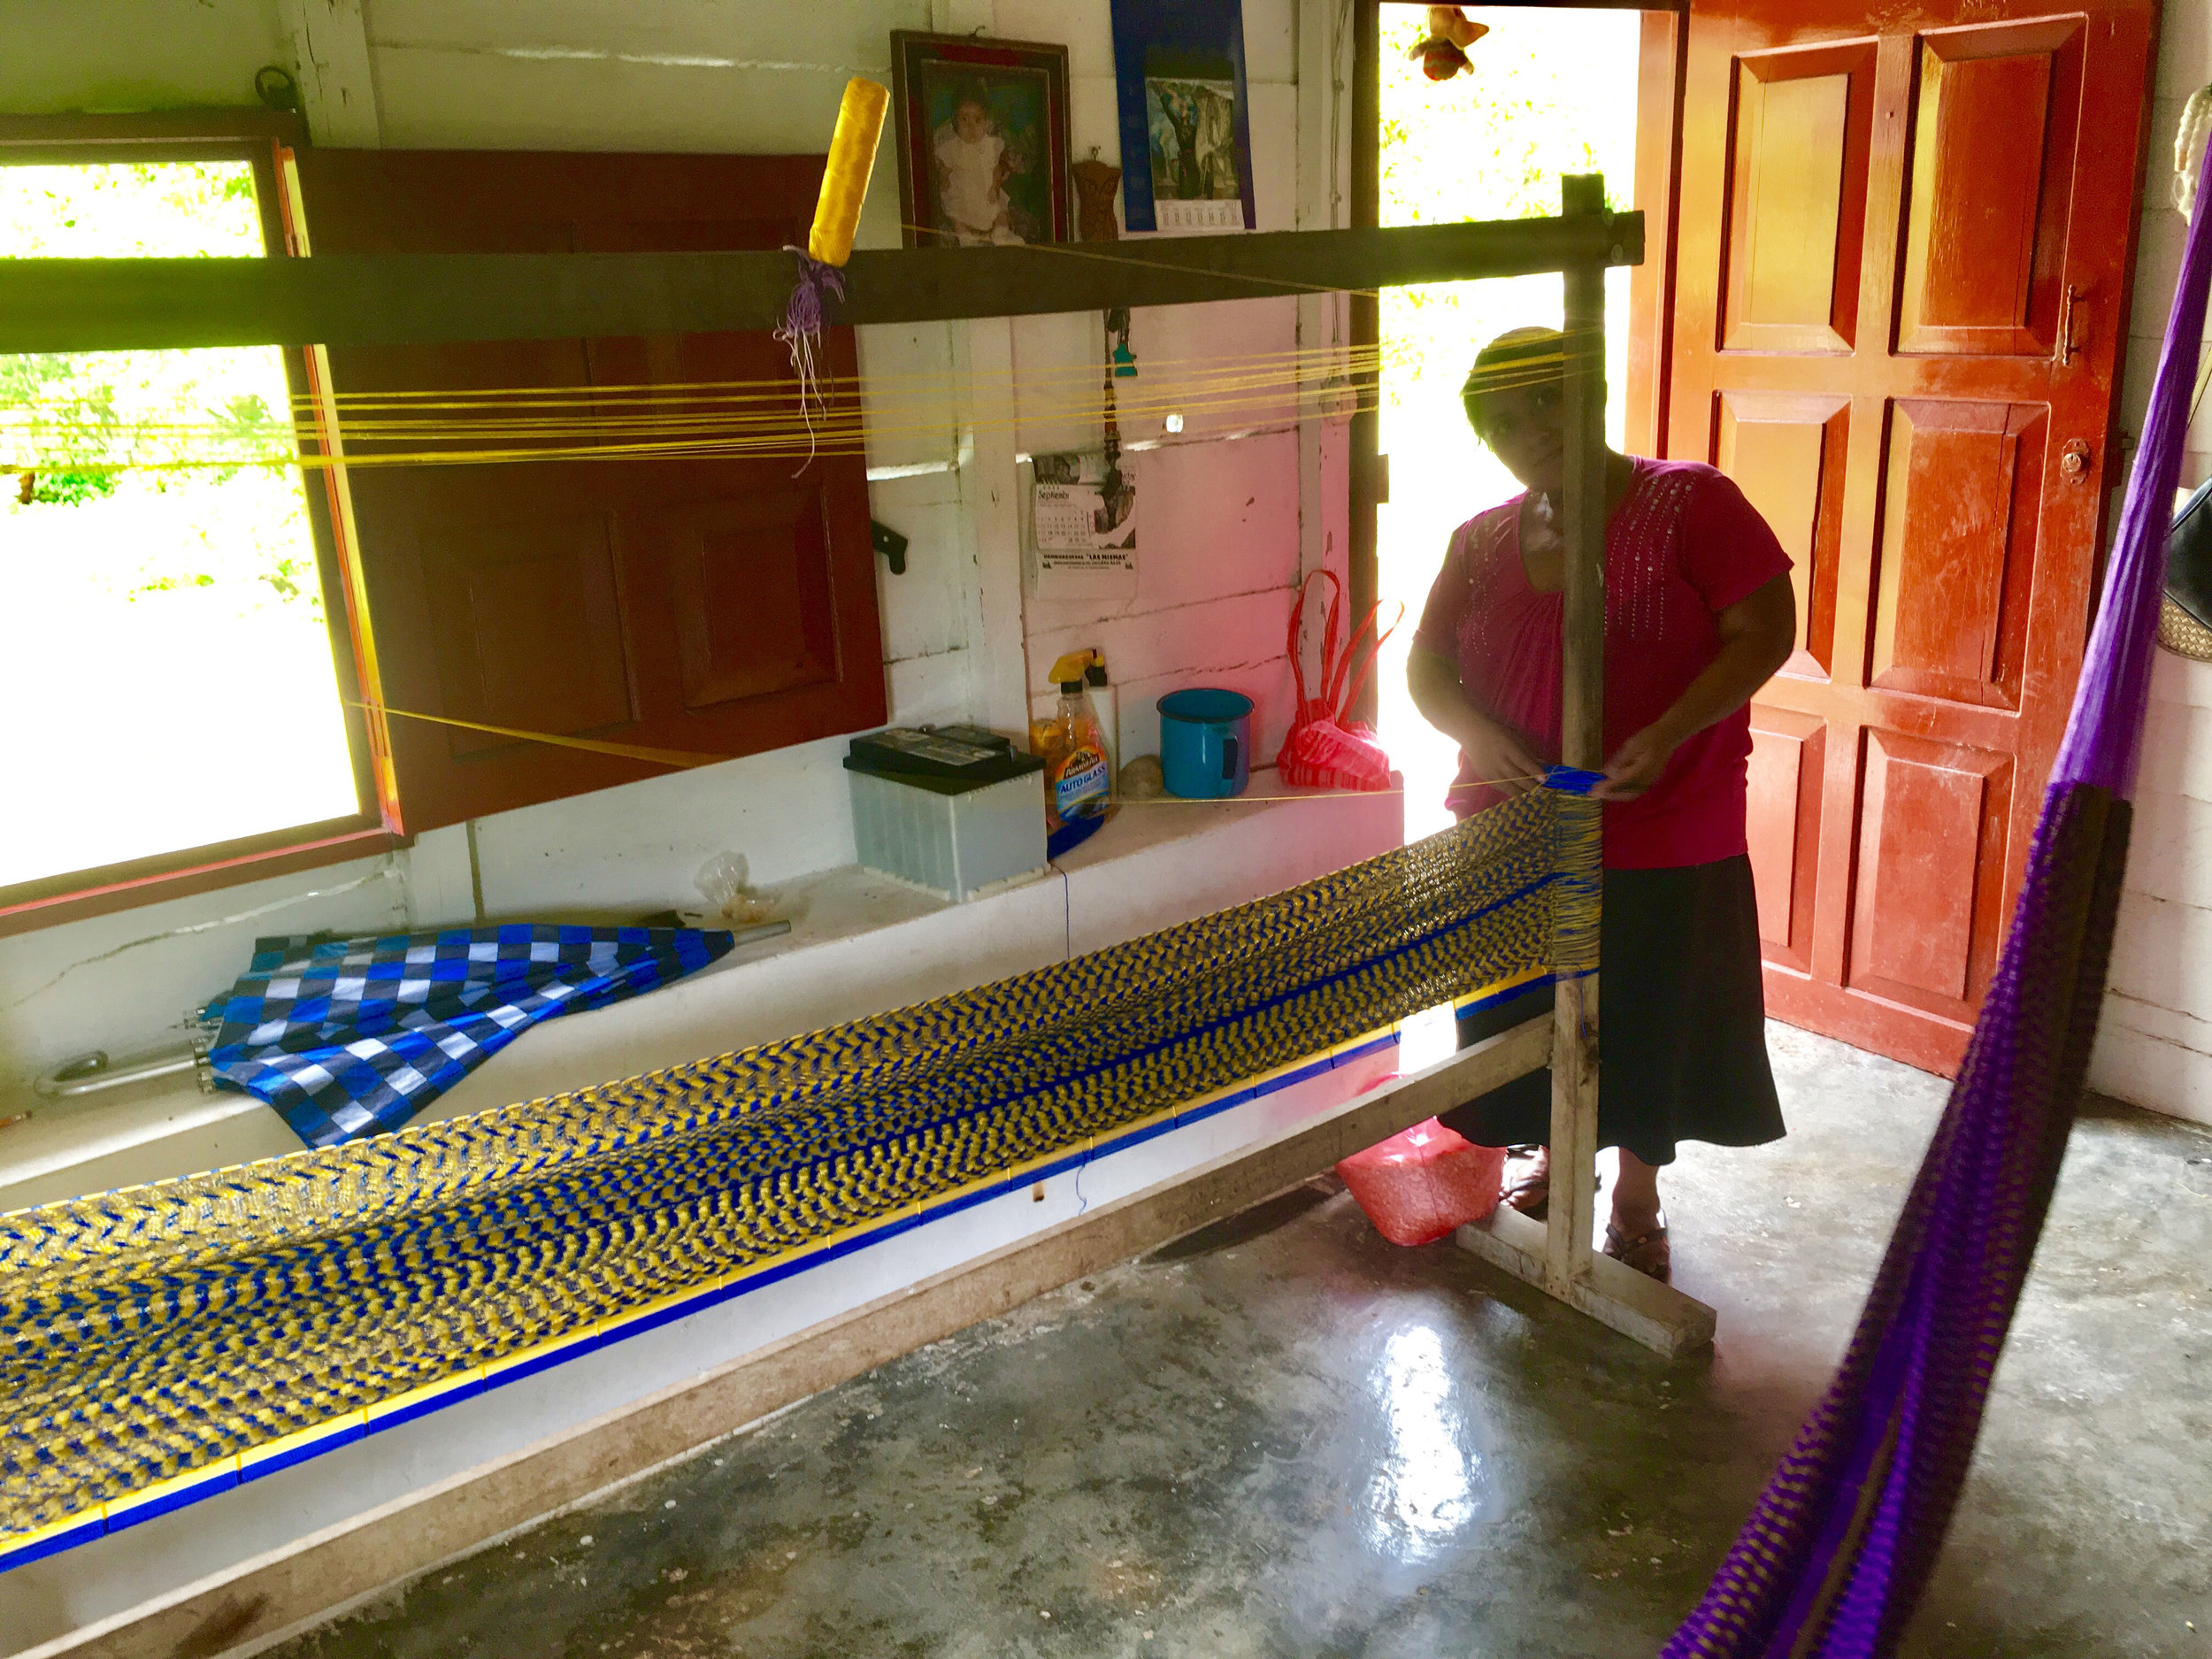 Fabiana weaving a hammock.